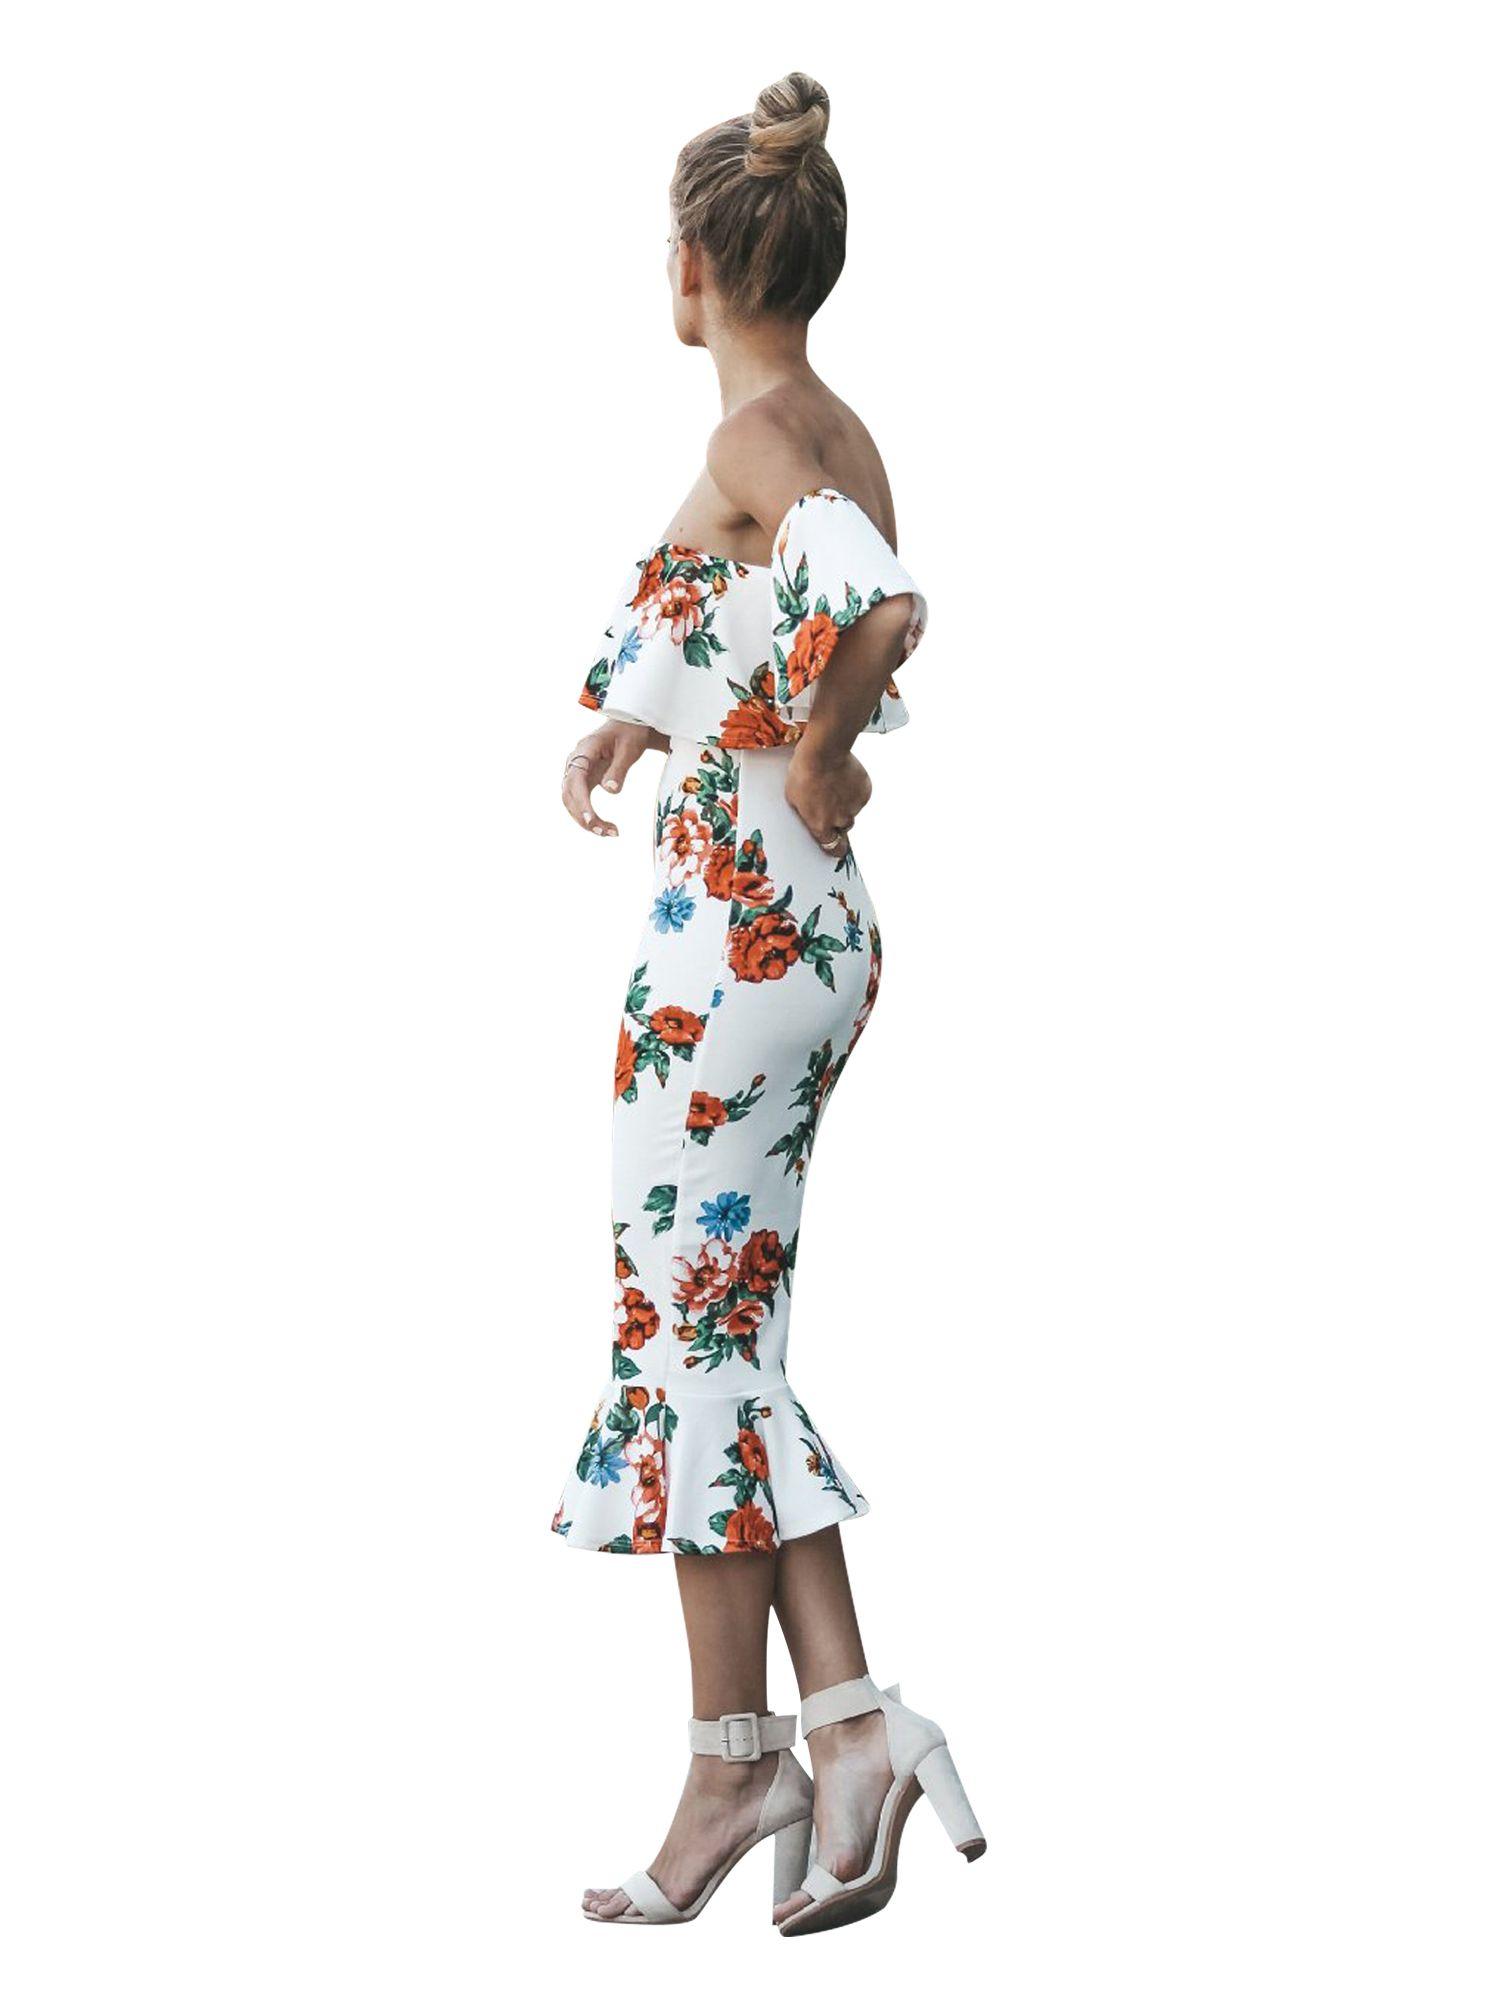 Floral Bodycon Dresses Women Ruffles Short Sleeve Long Midi Formal Cocktail Evening Party Off Shoulder Backless Dress #shortbacklessdress